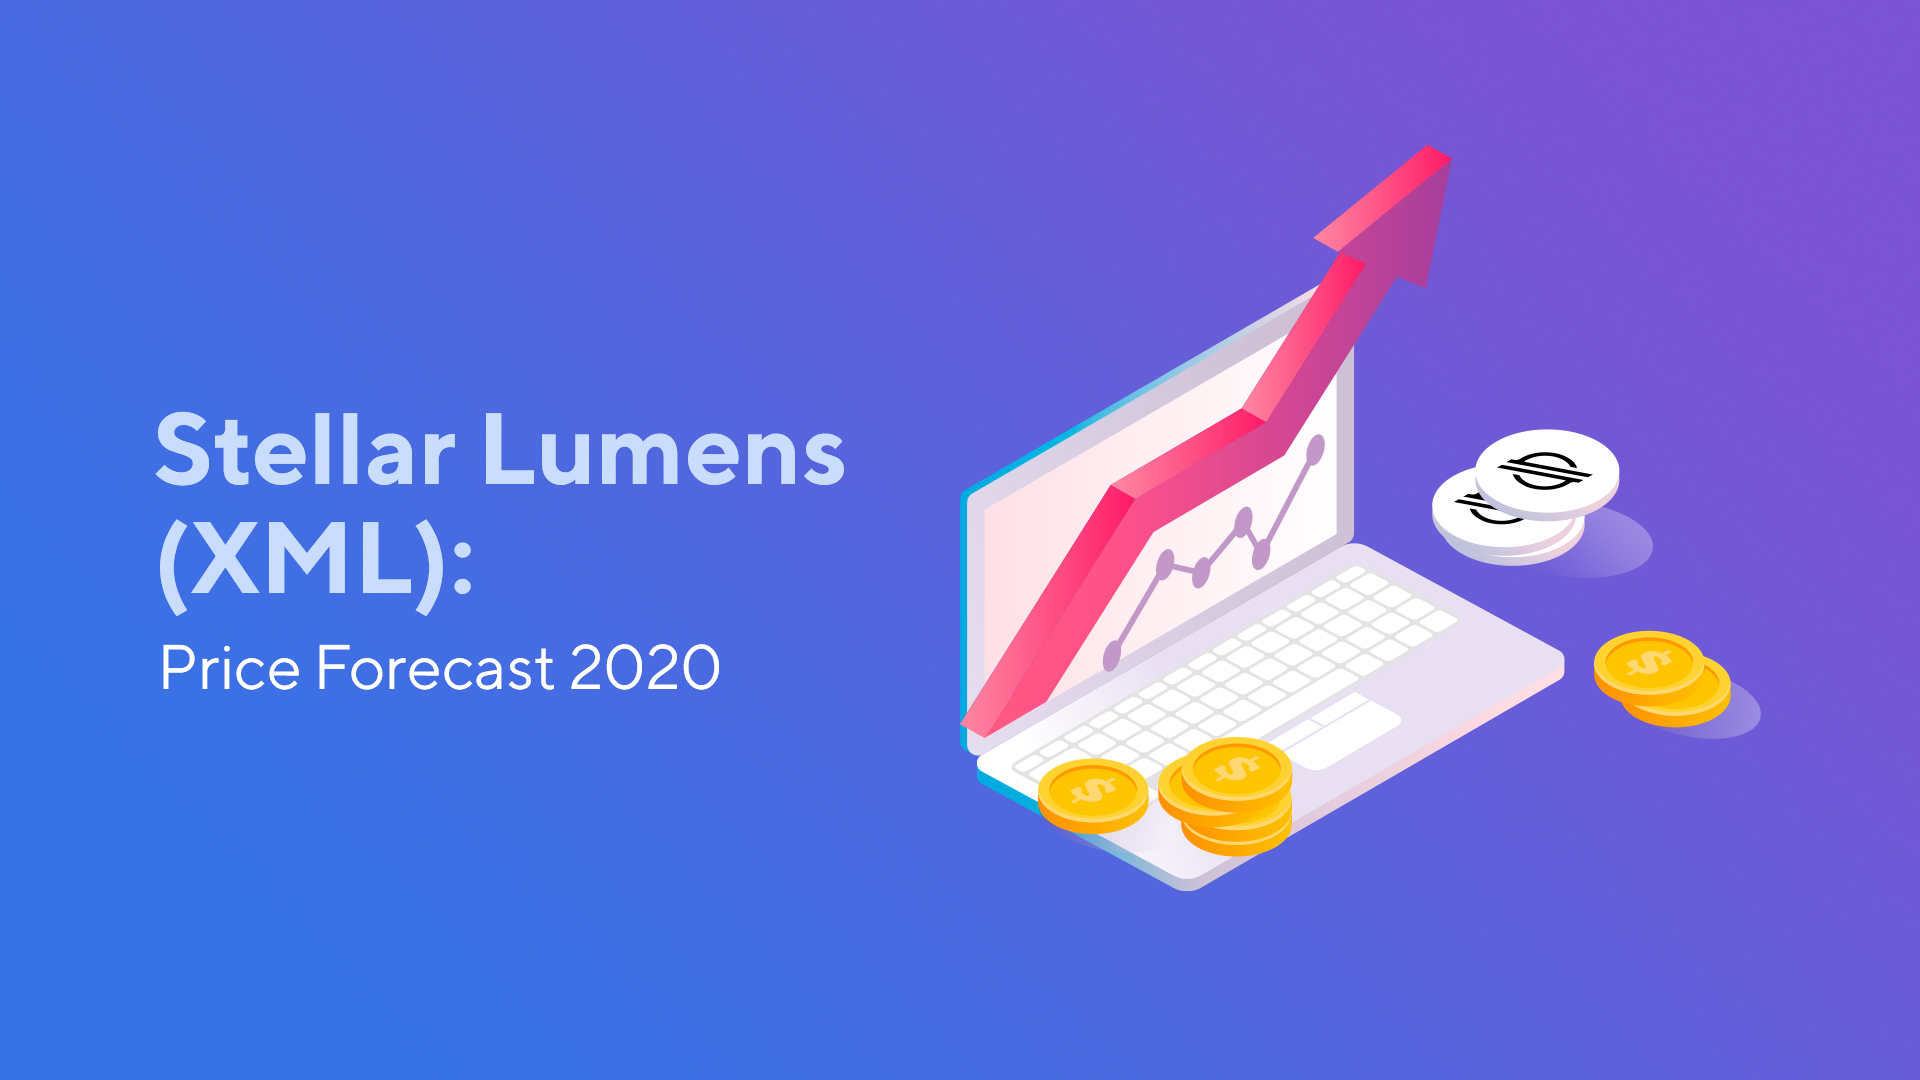 Stellar Lumens (XML): Price Forecast 2020